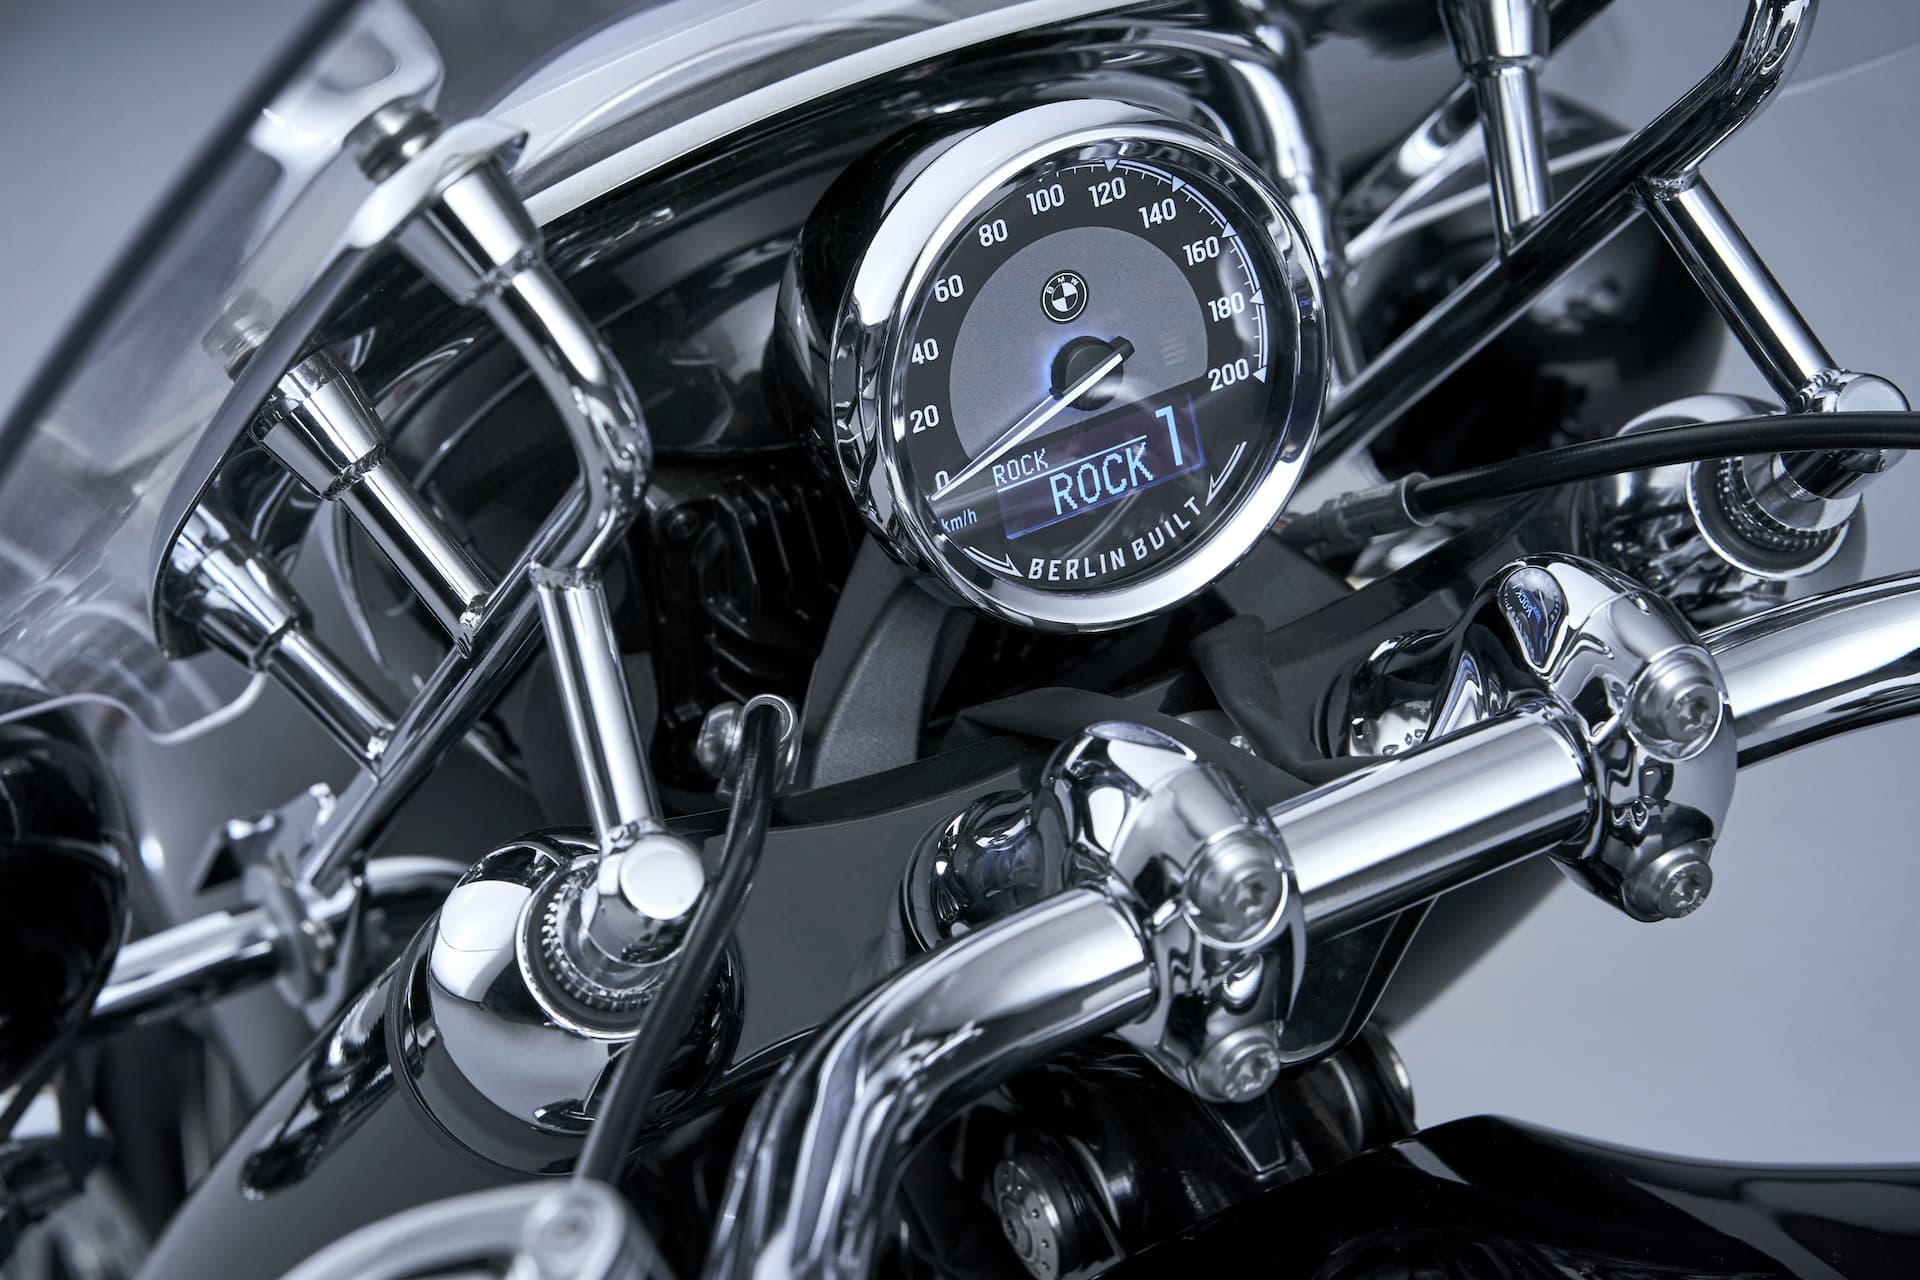 Moto Bmw R18 Classic Esfera